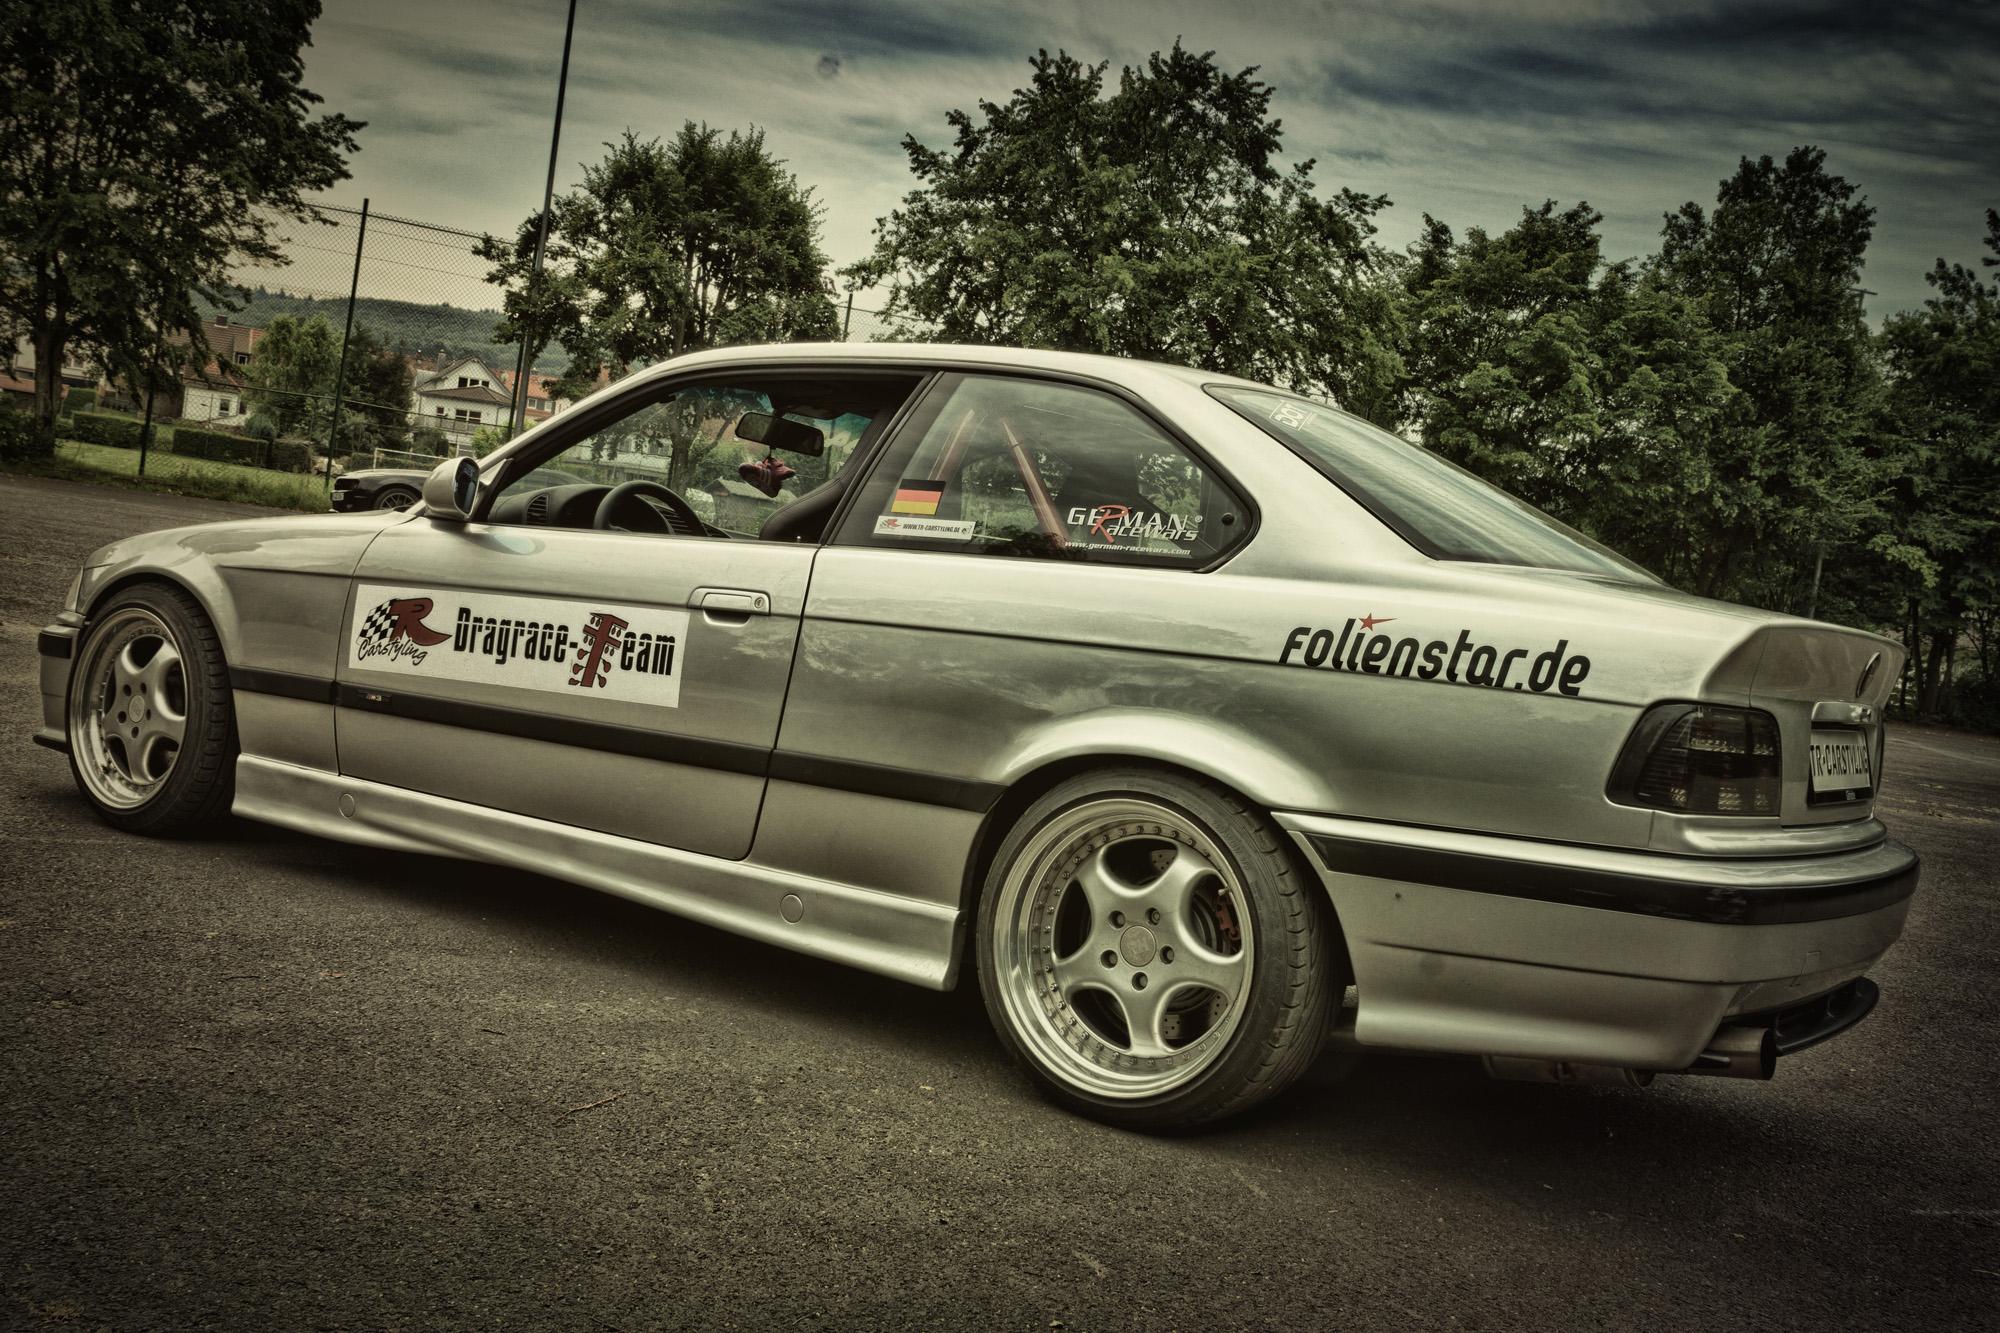 bmw-m3-e36-turbo-tr-carstyling-18